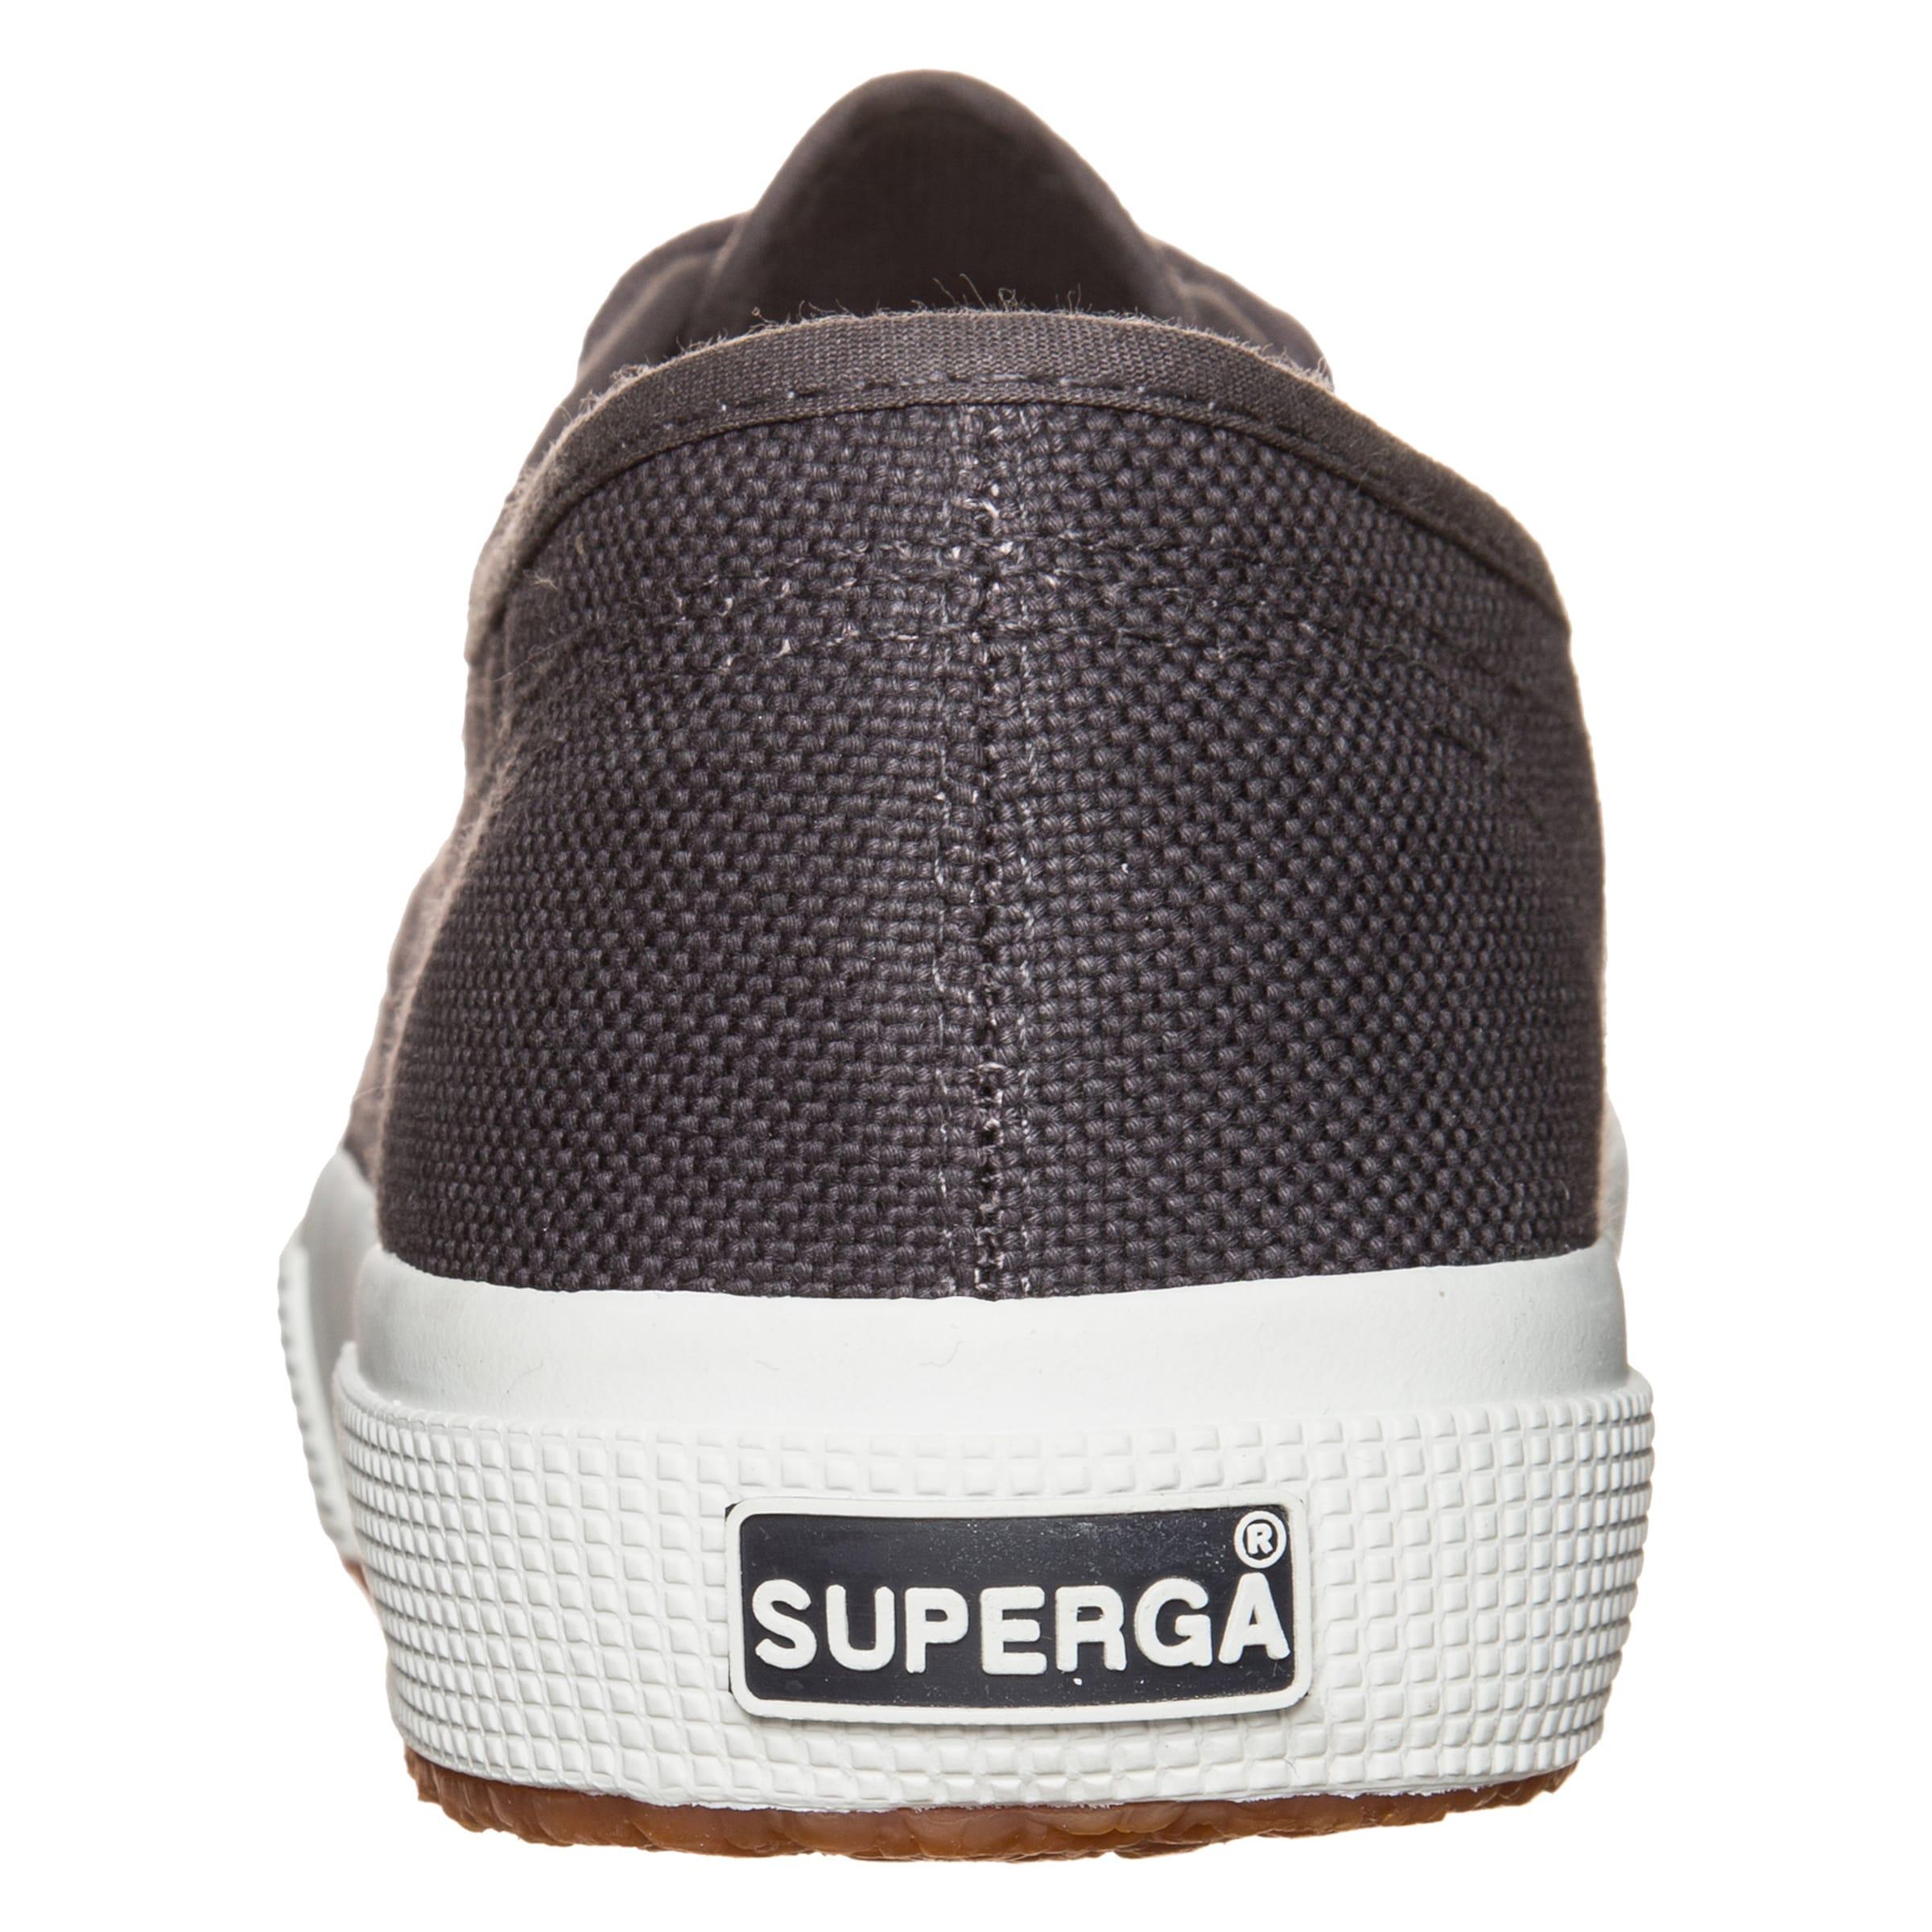 Superga DunkelgrauWeiß In Superga Sneaker Sneaker In Superga DunkelgrauWeiß In DunkelgrauWeiß Sneaker 6f7gbYy